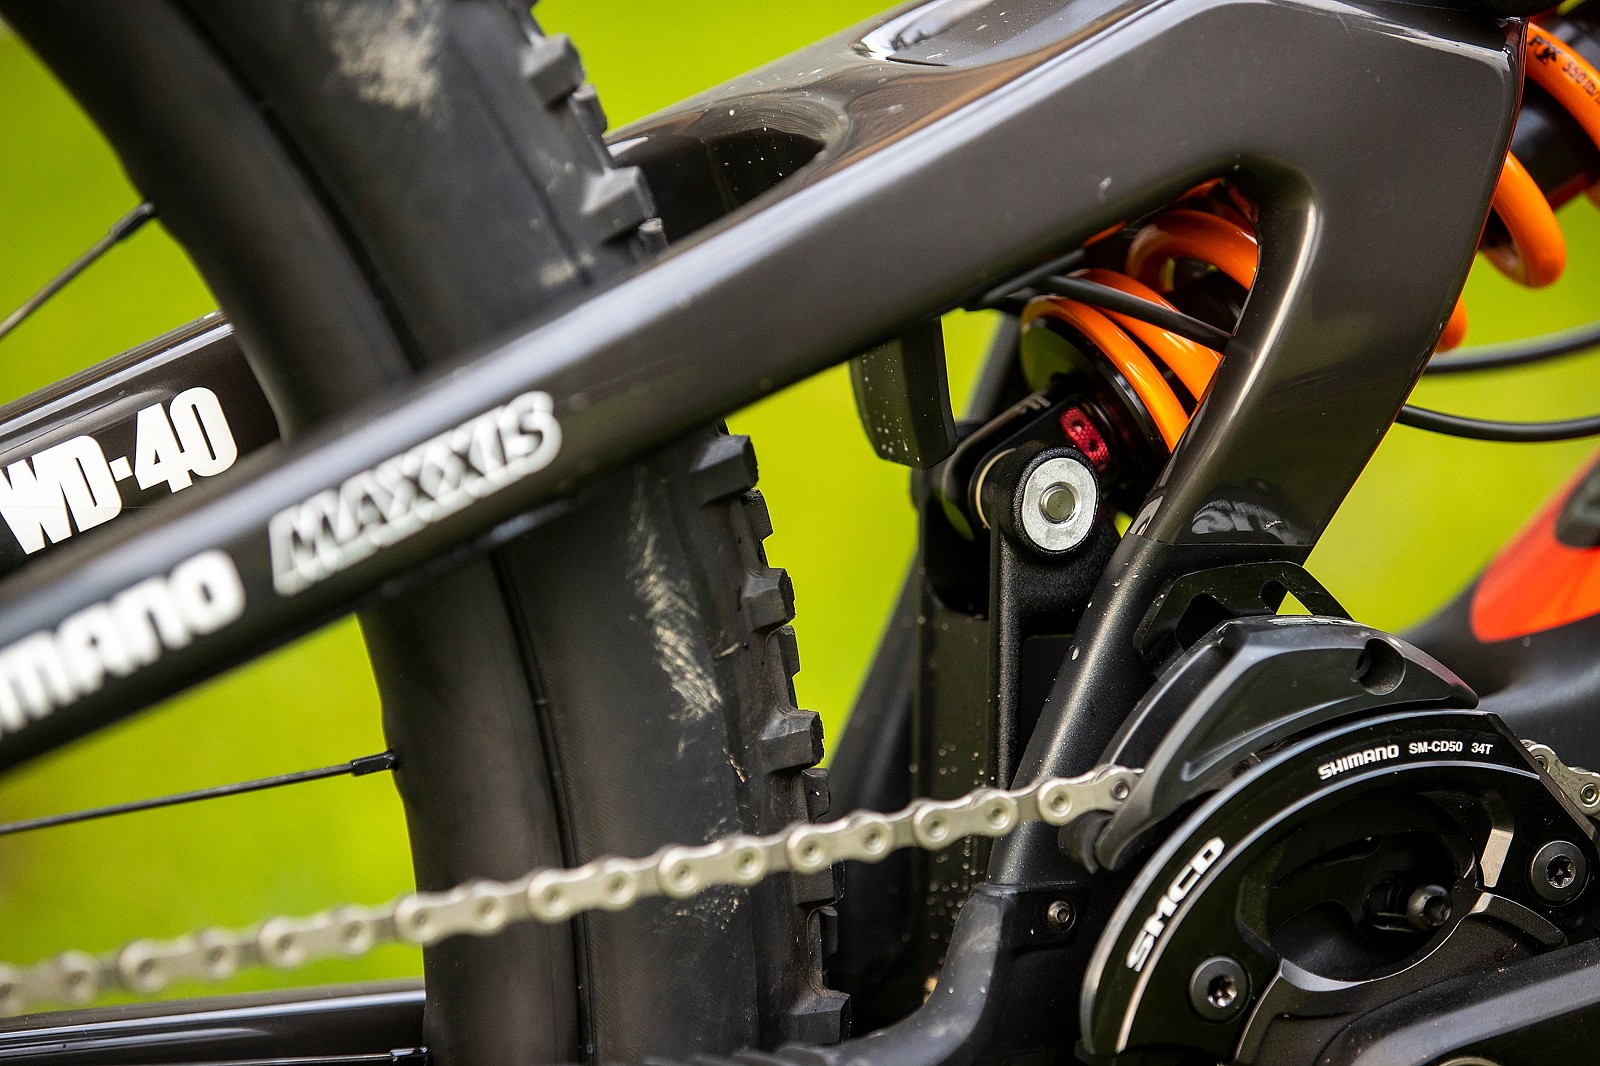 Flip Chip - WORLD CHAMPS BIKE - Greg Minnaar's Santa Cruz V10 - Mountain Biking Pictures - Vital MTB